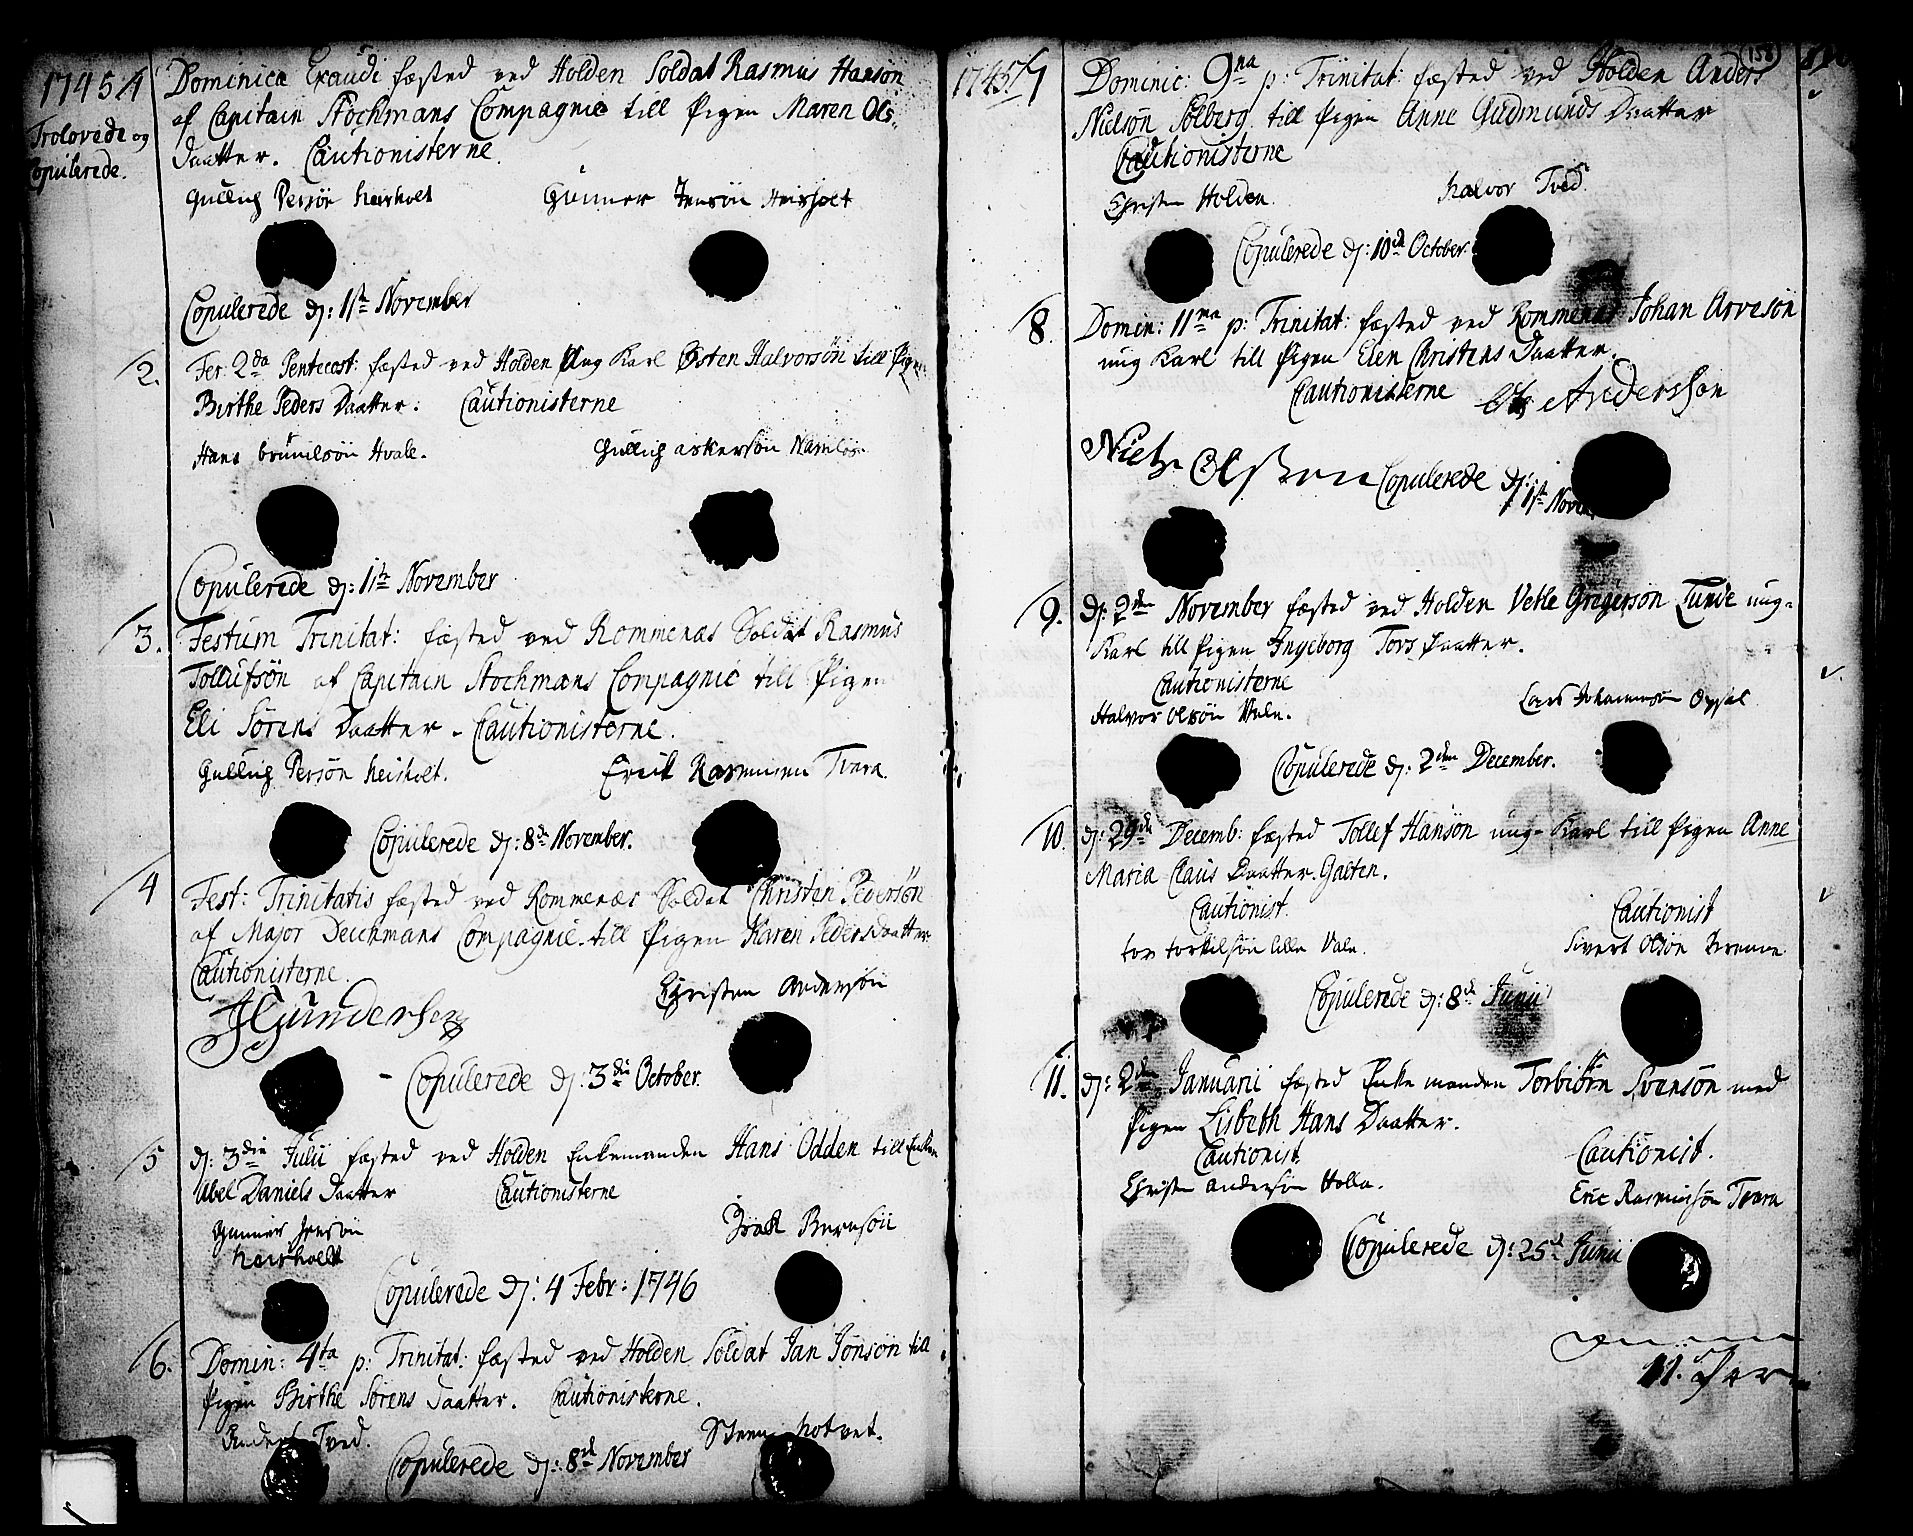 SAKO, Holla kirkebøker, F/Fa/L0001: Ministerialbok nr. 1, 1717-1779, s. 158